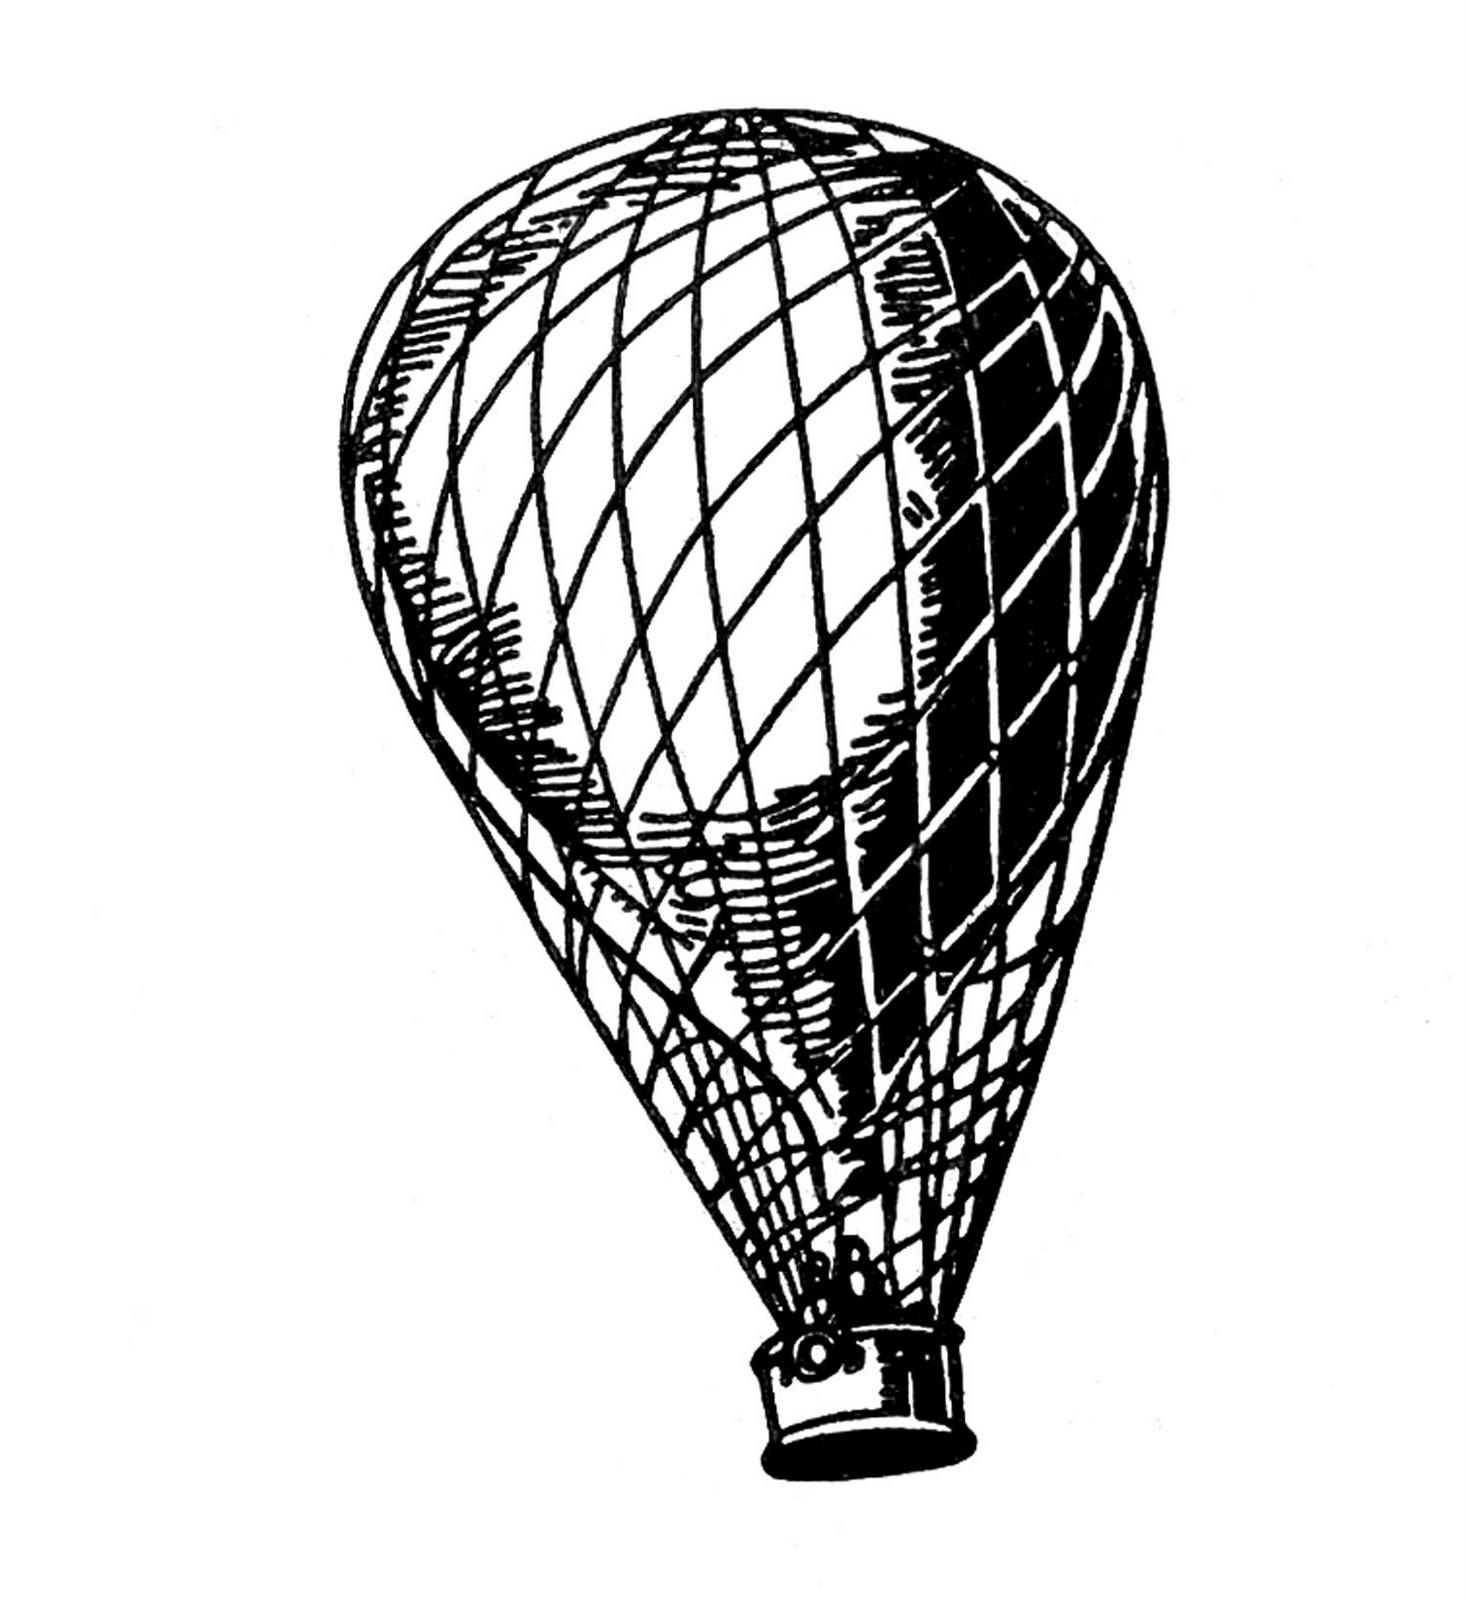 Vintage clip art transportation balloon airship aeroplane